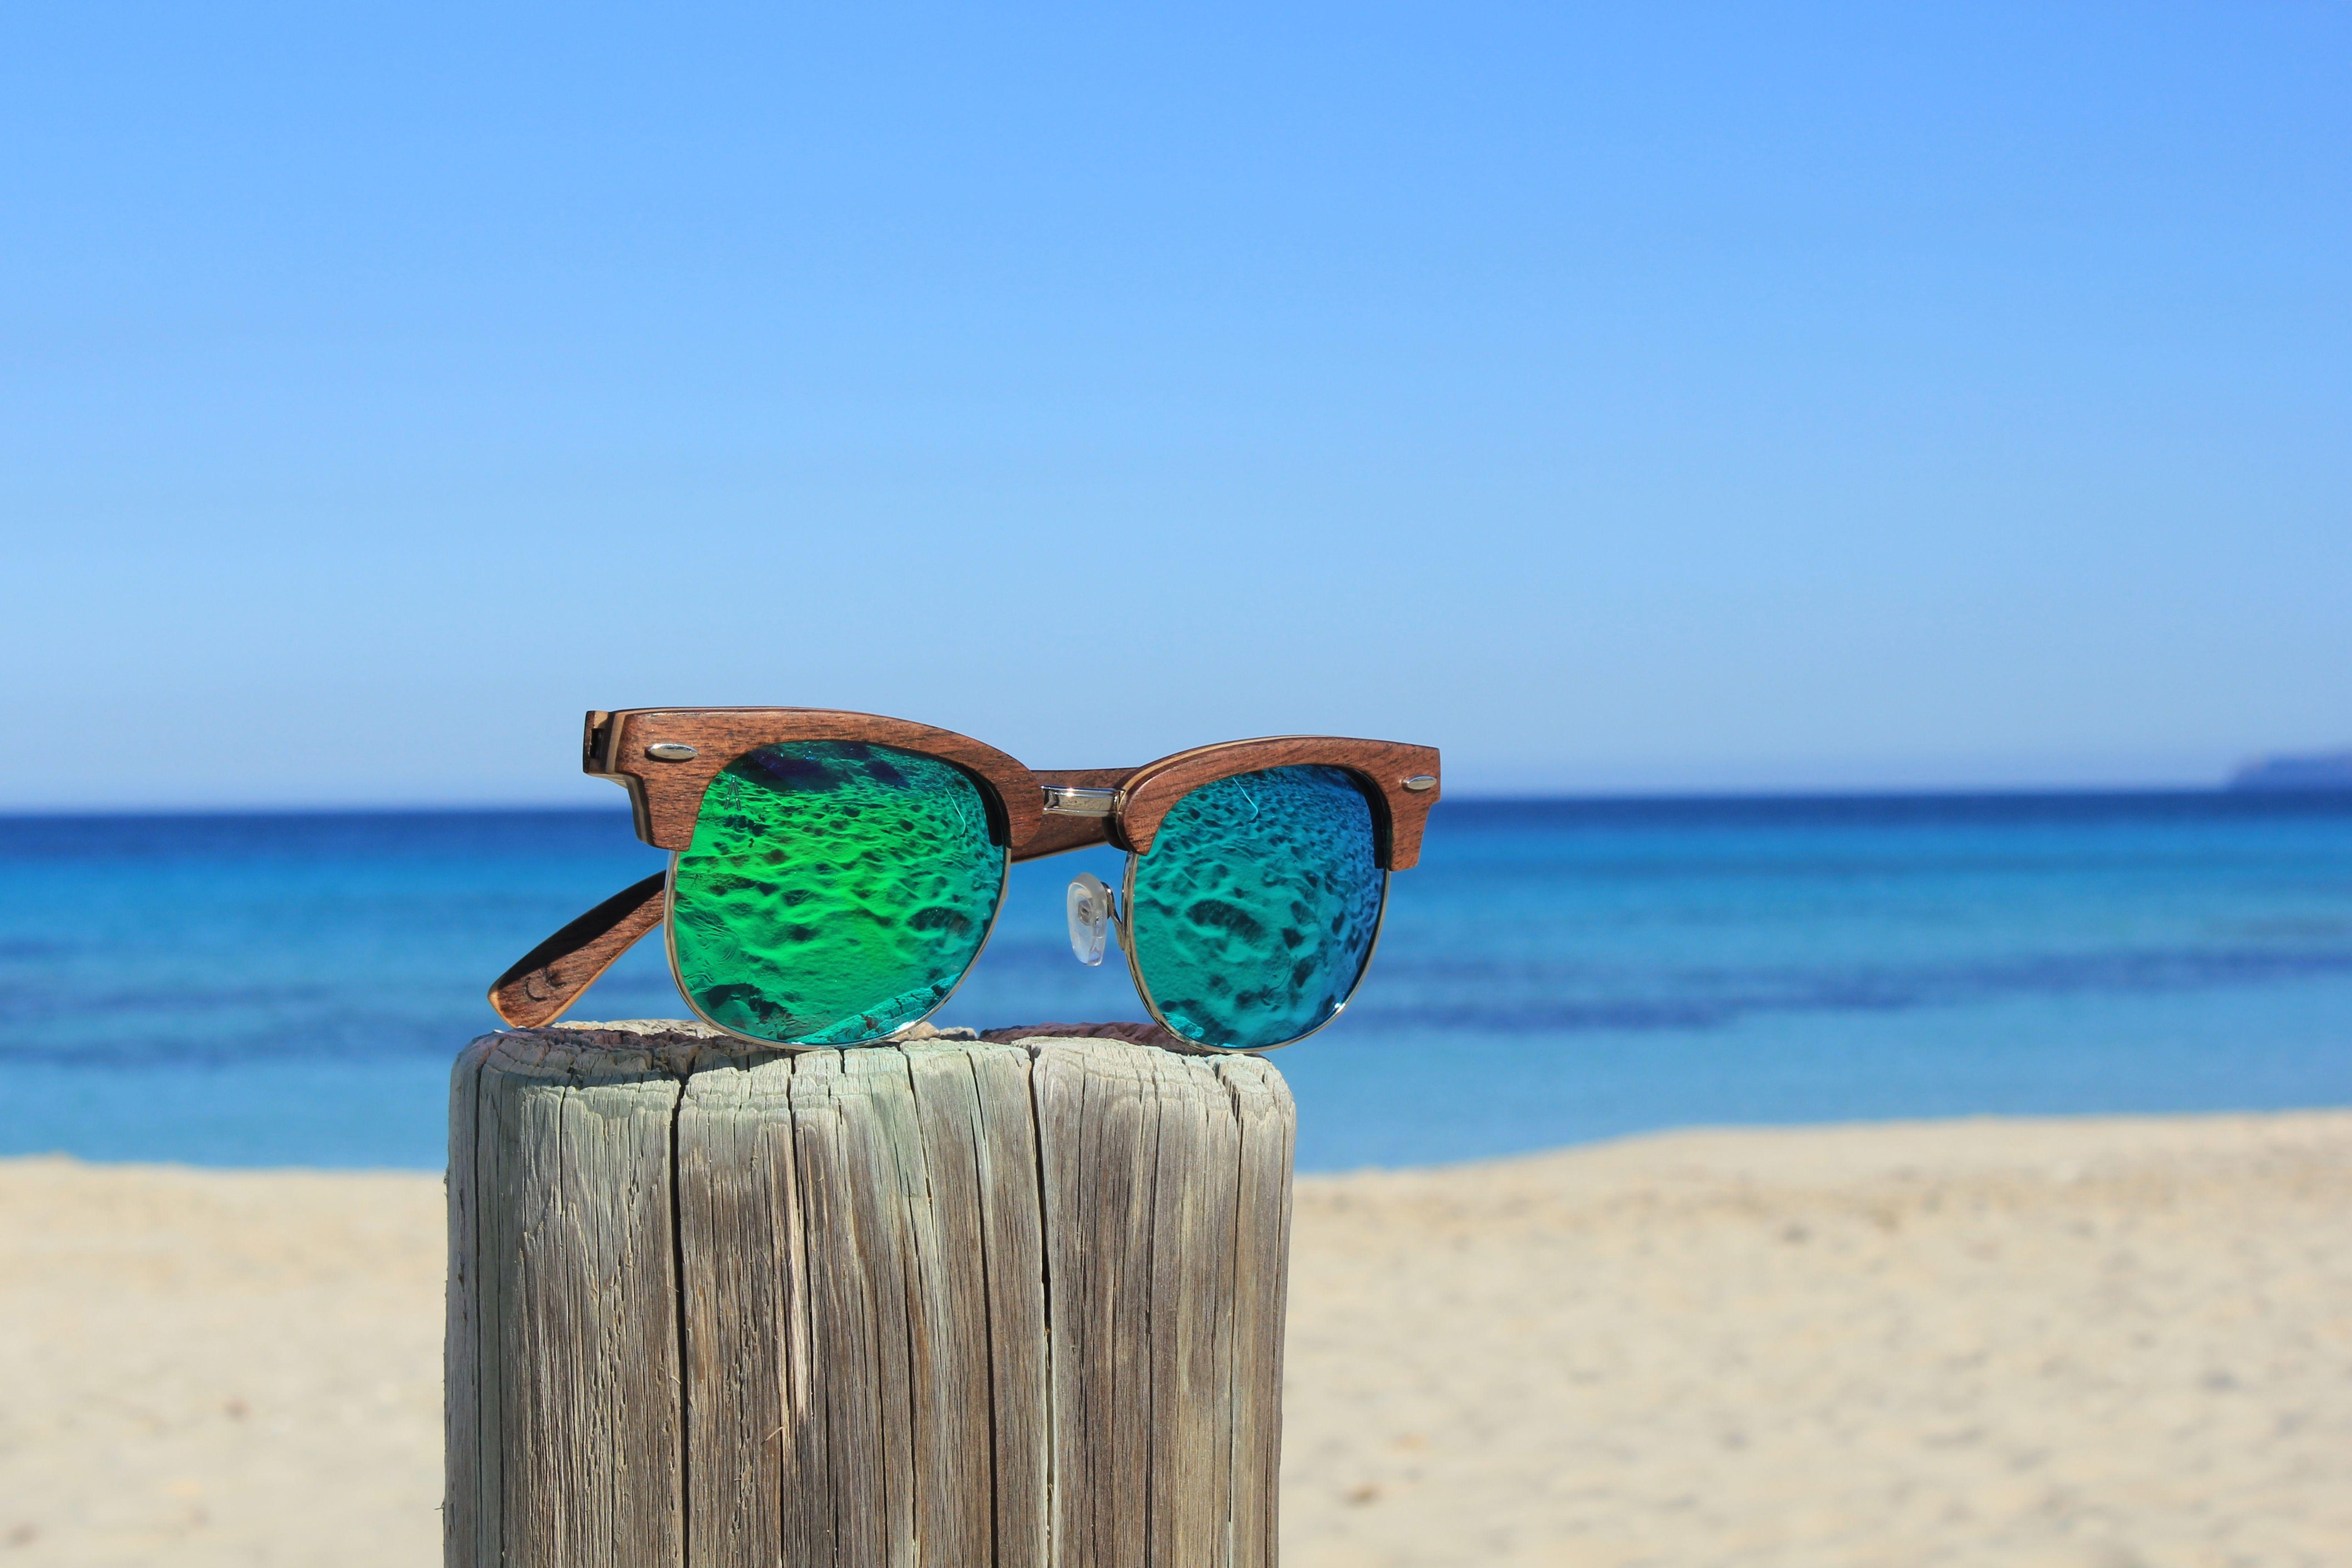 68e5b75790 Henzo - Gafas de sol unisex, con montura de madera de Nogal realizadas a  mano